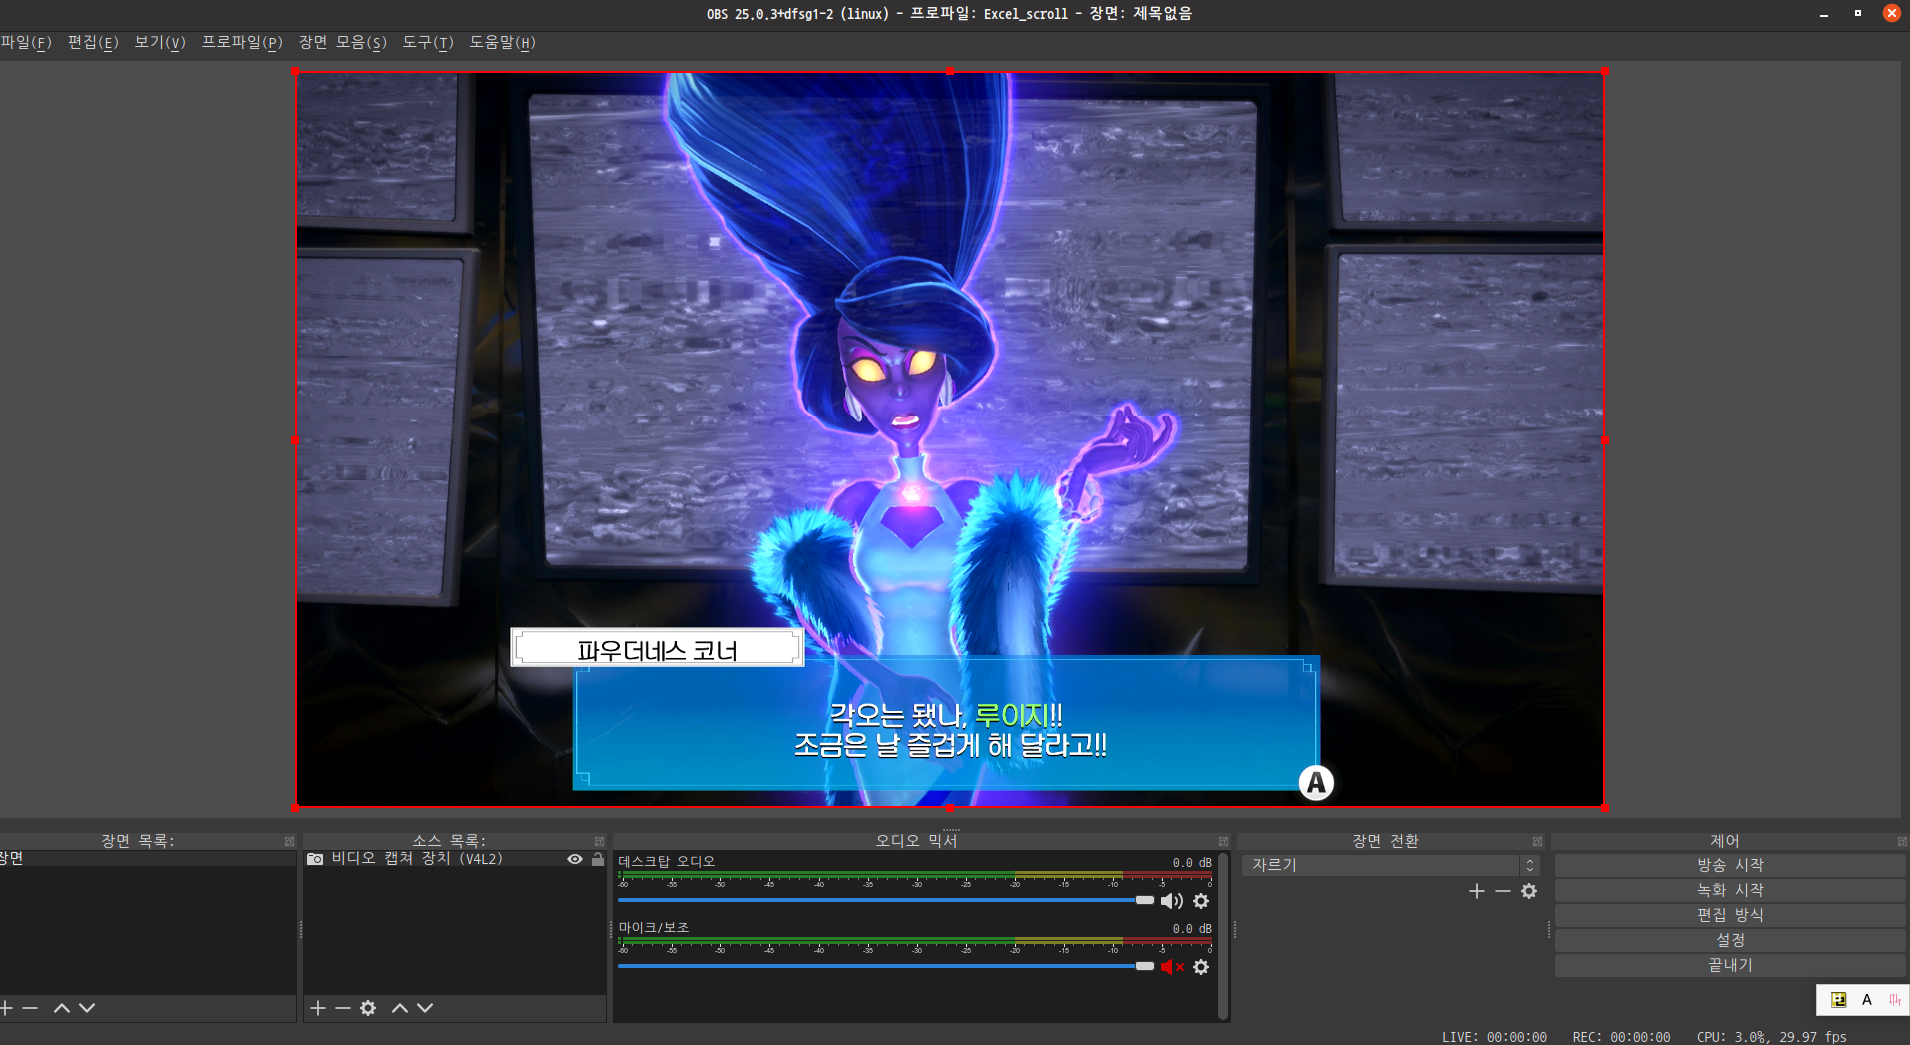 OBS Studio 에서 닌텐도 스위치 녹화